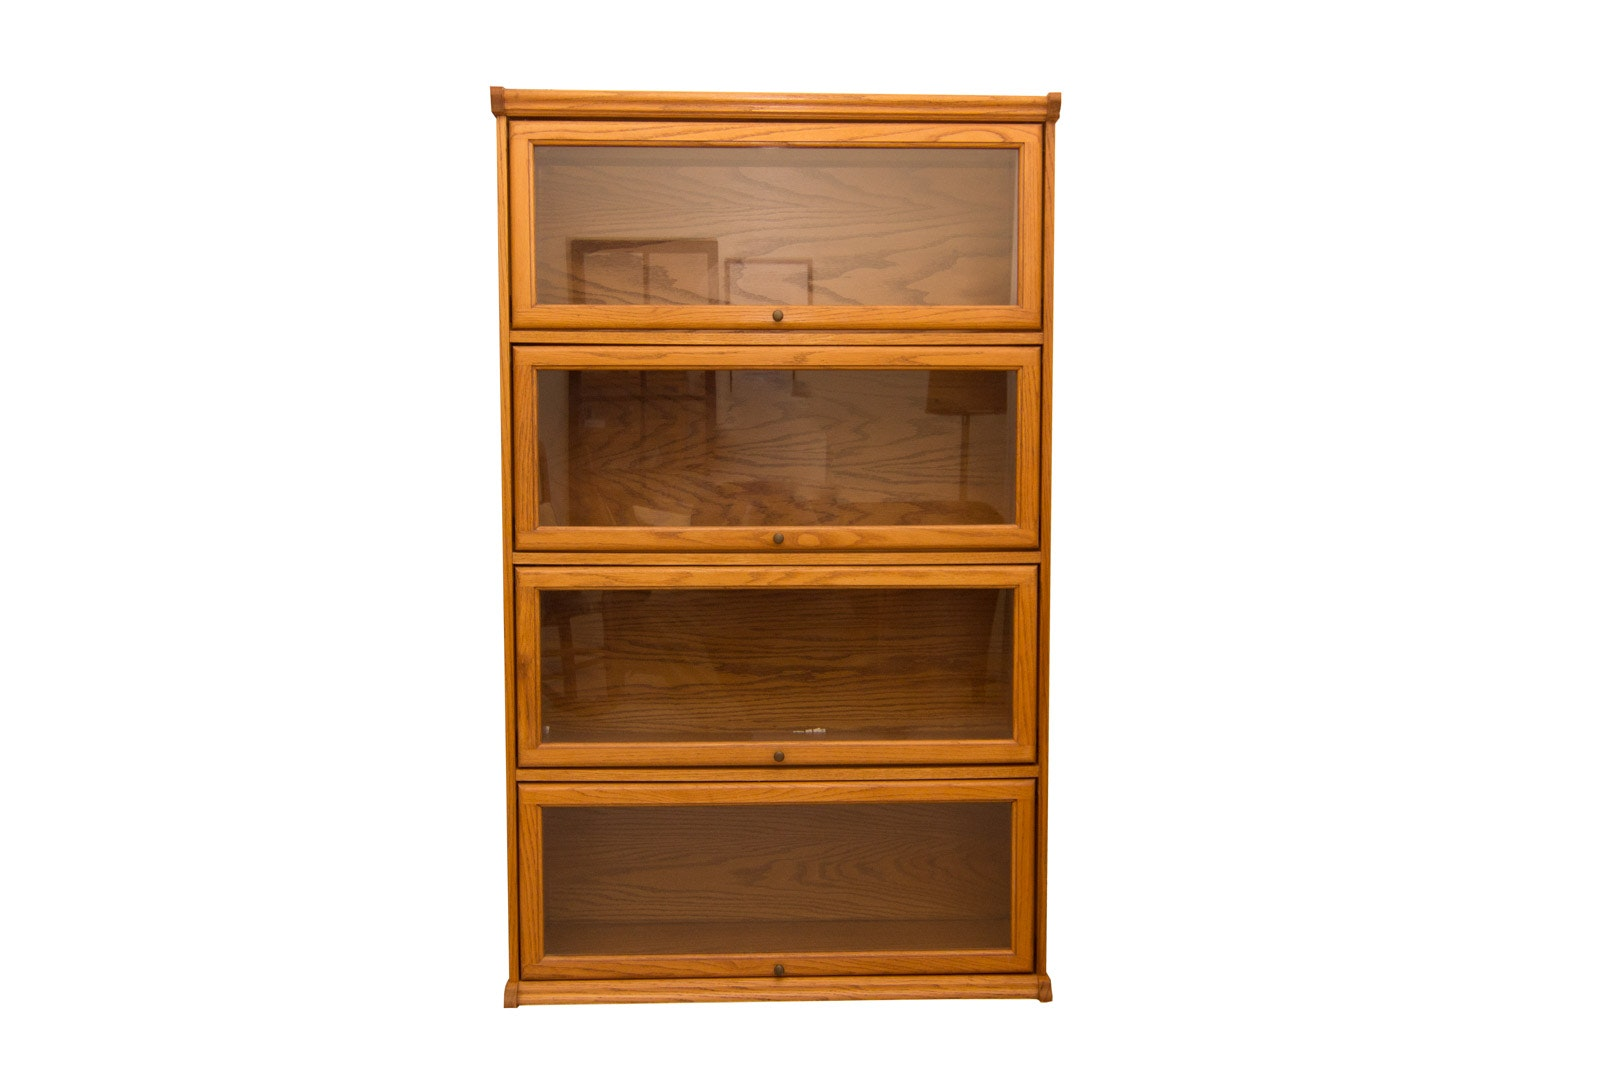 Oak Barrister's Style Bookcase/Cabinet